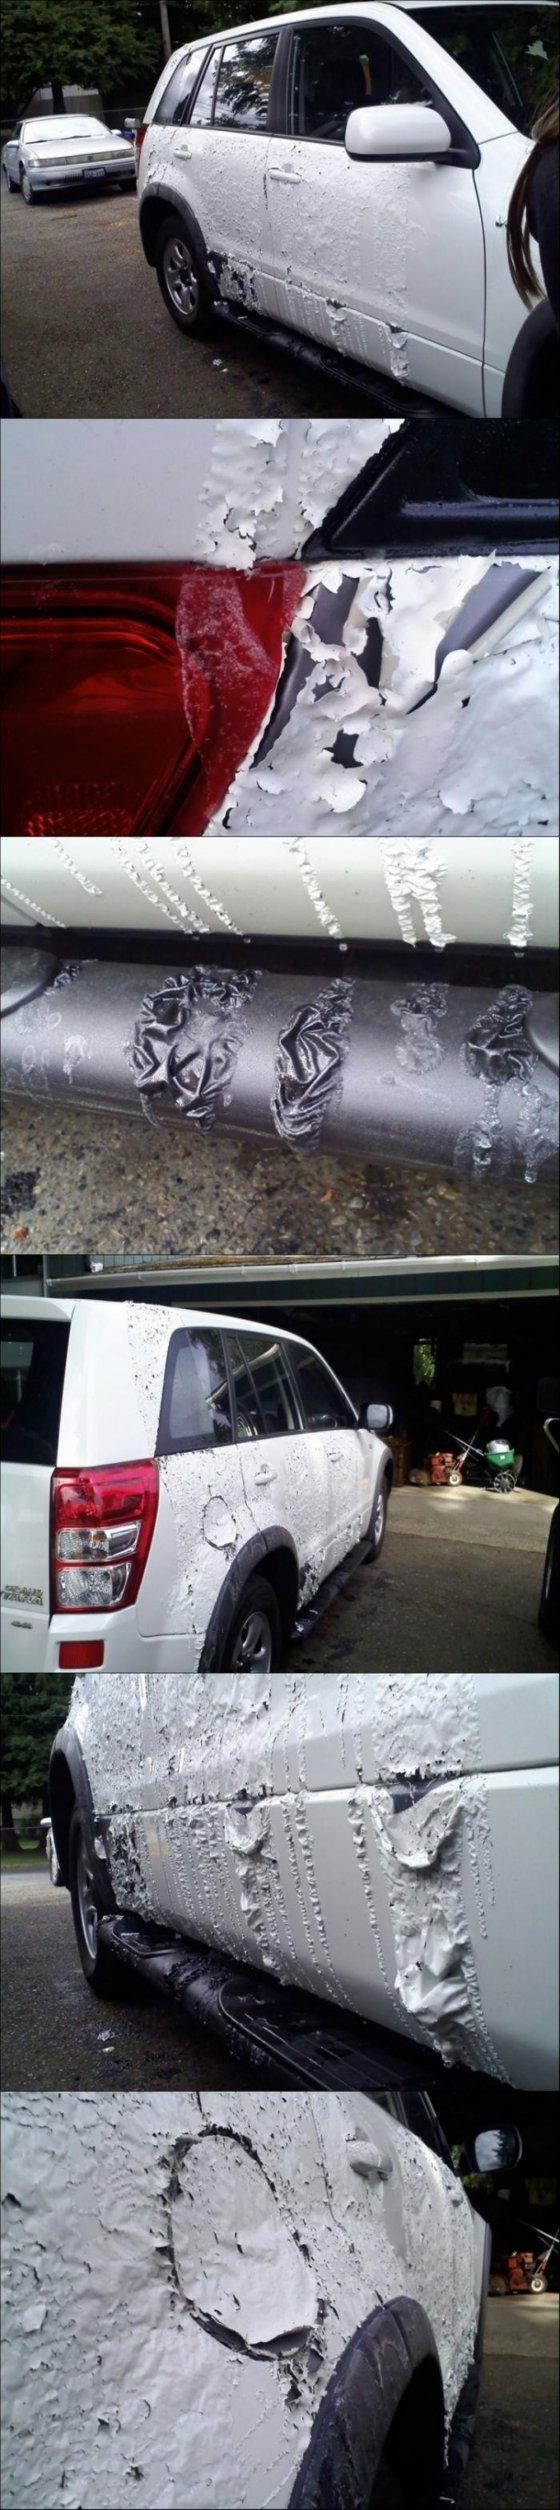 """Suzuki Grand Vitara""–ს პატრონის მუდმივი აბეზარი საქციელის გამო მეზობლებმა მანქანას მჟავა გადაასხეს."